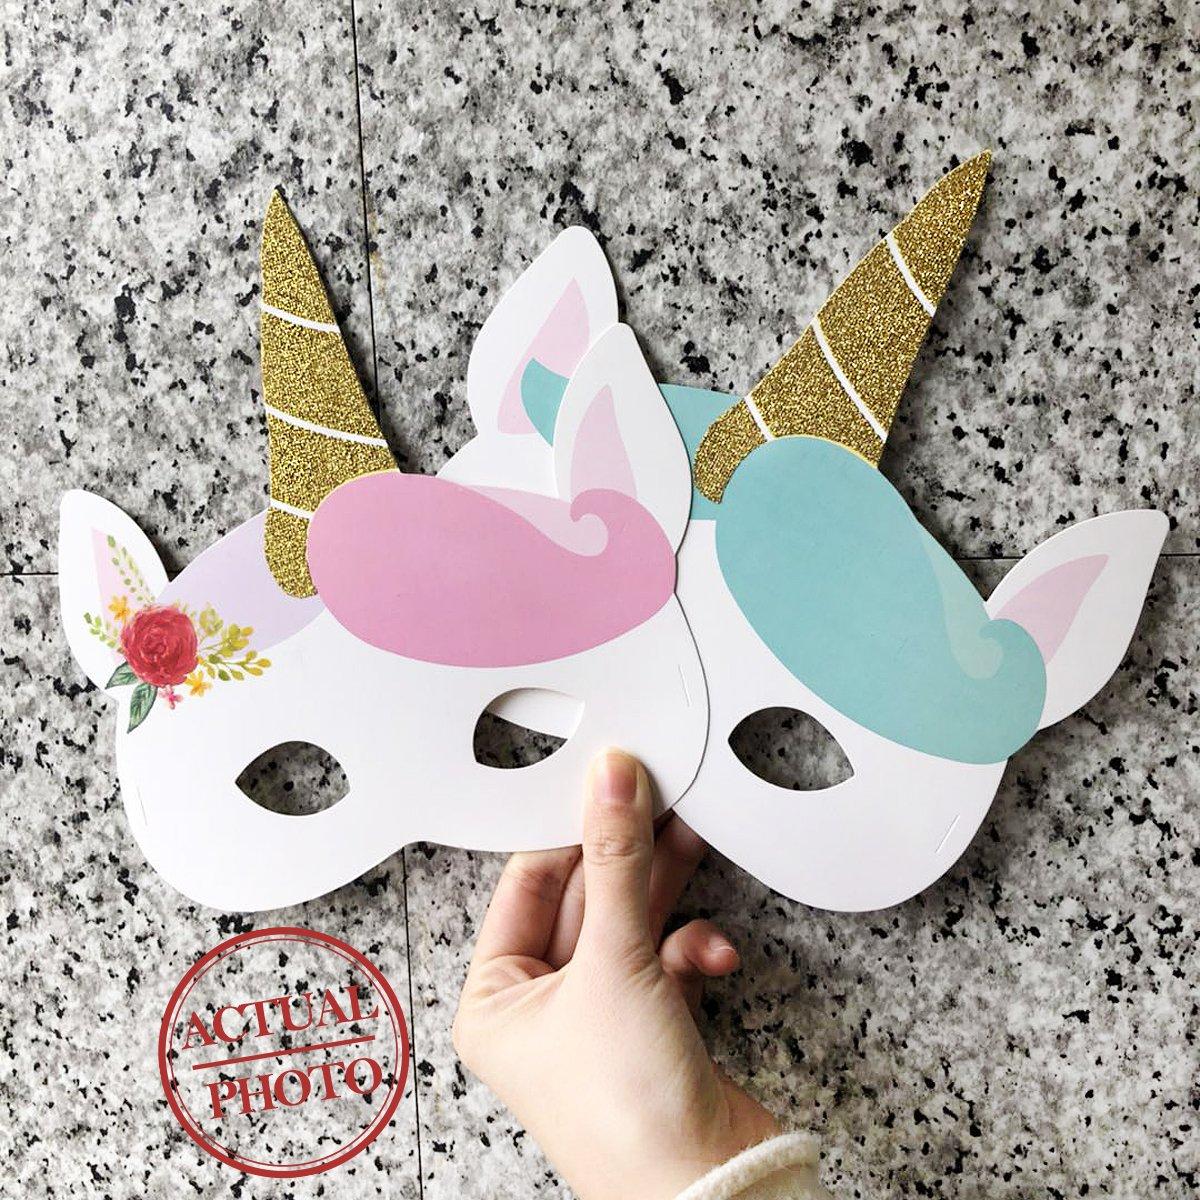 NICROLANDEE 12pcs Unicorn Party Decoration Kids Paper Mask Birthday Halloween by NICROLANDEE (Image #7)